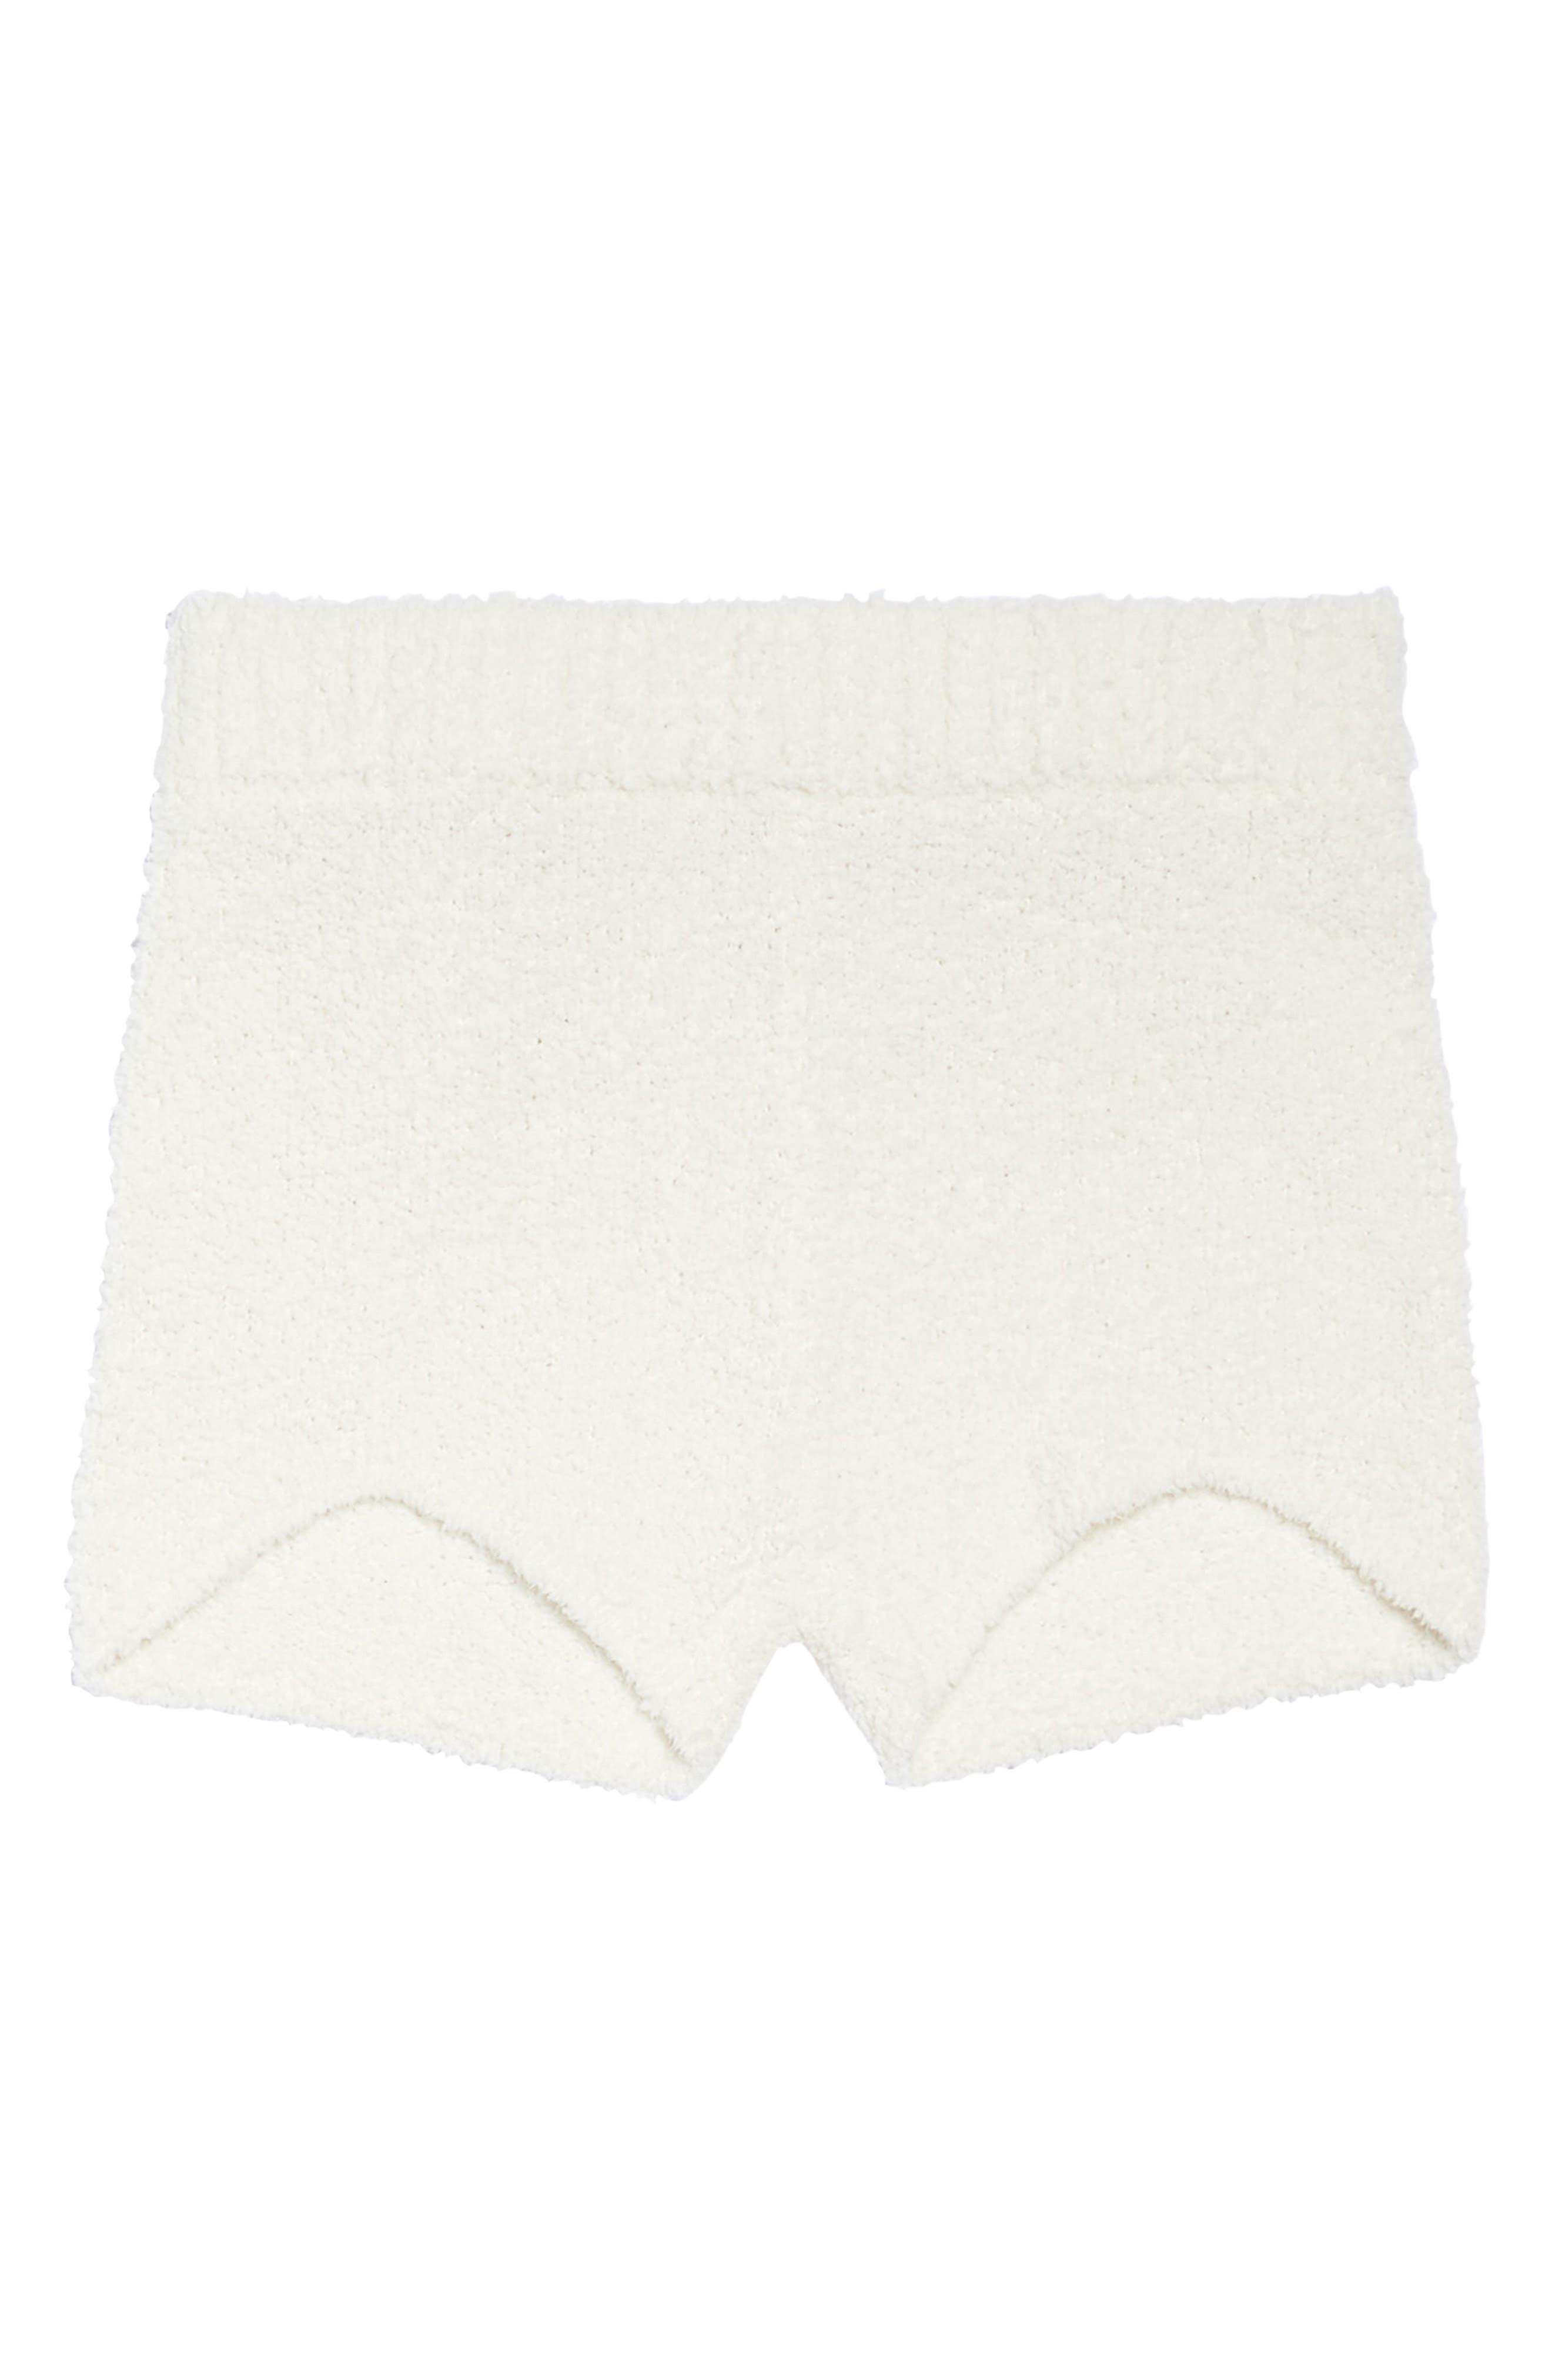 Sweater Knit Pajama Shorts,                             Alternate thumbnail 6, color,                             900